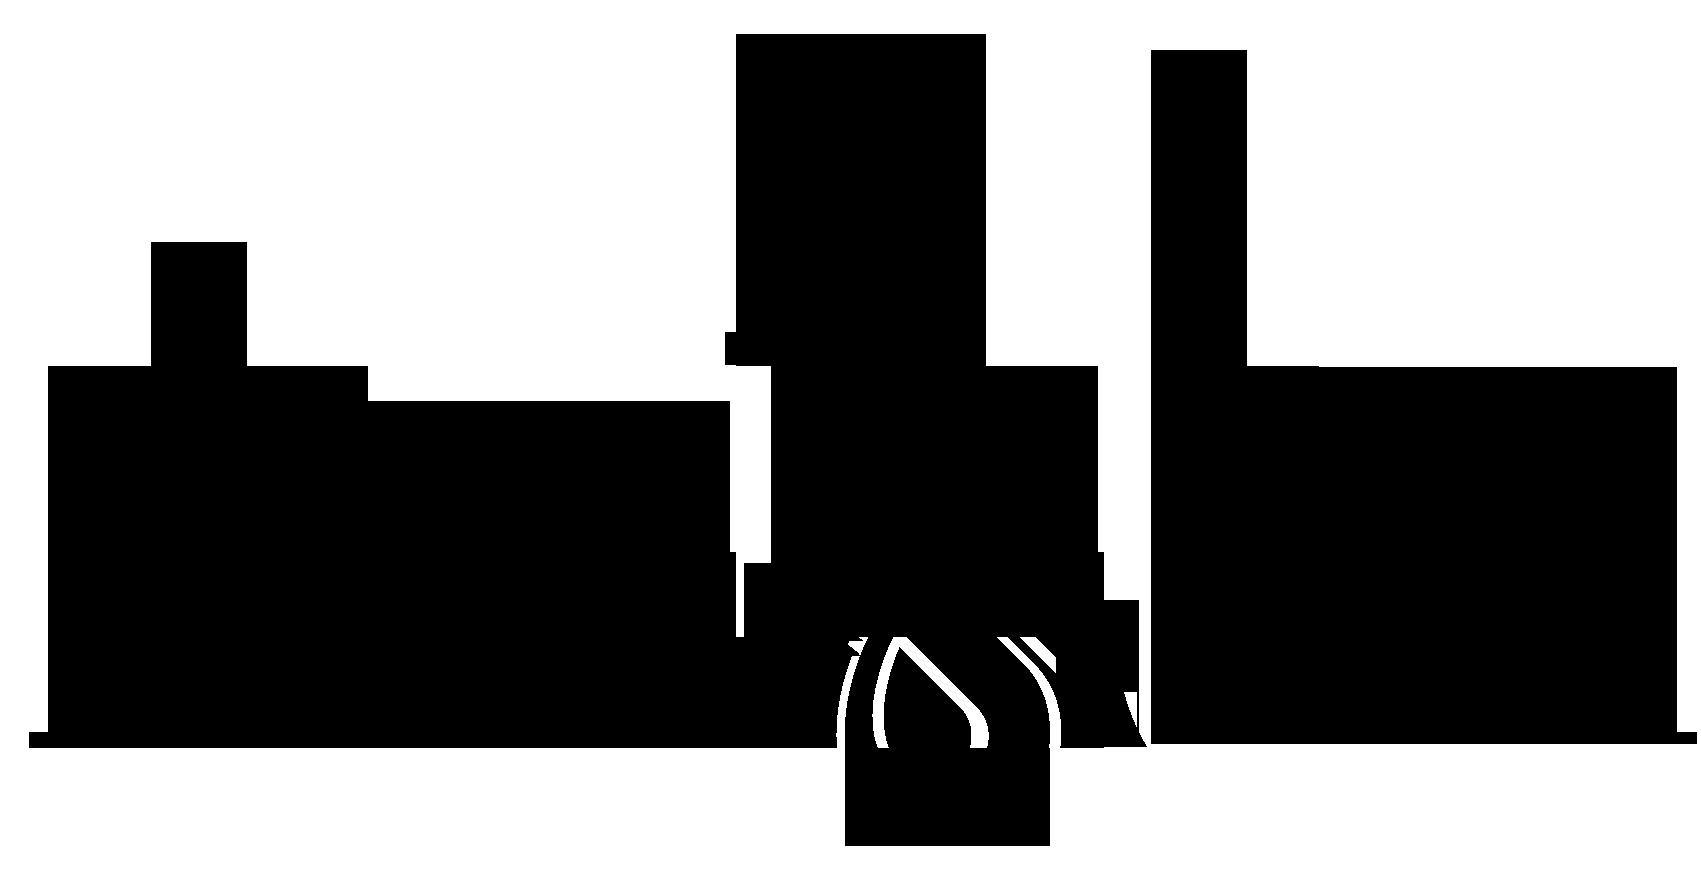 ��� ����� ����� ��� ����� 2014 , ��� ������ ��� ����� 2014